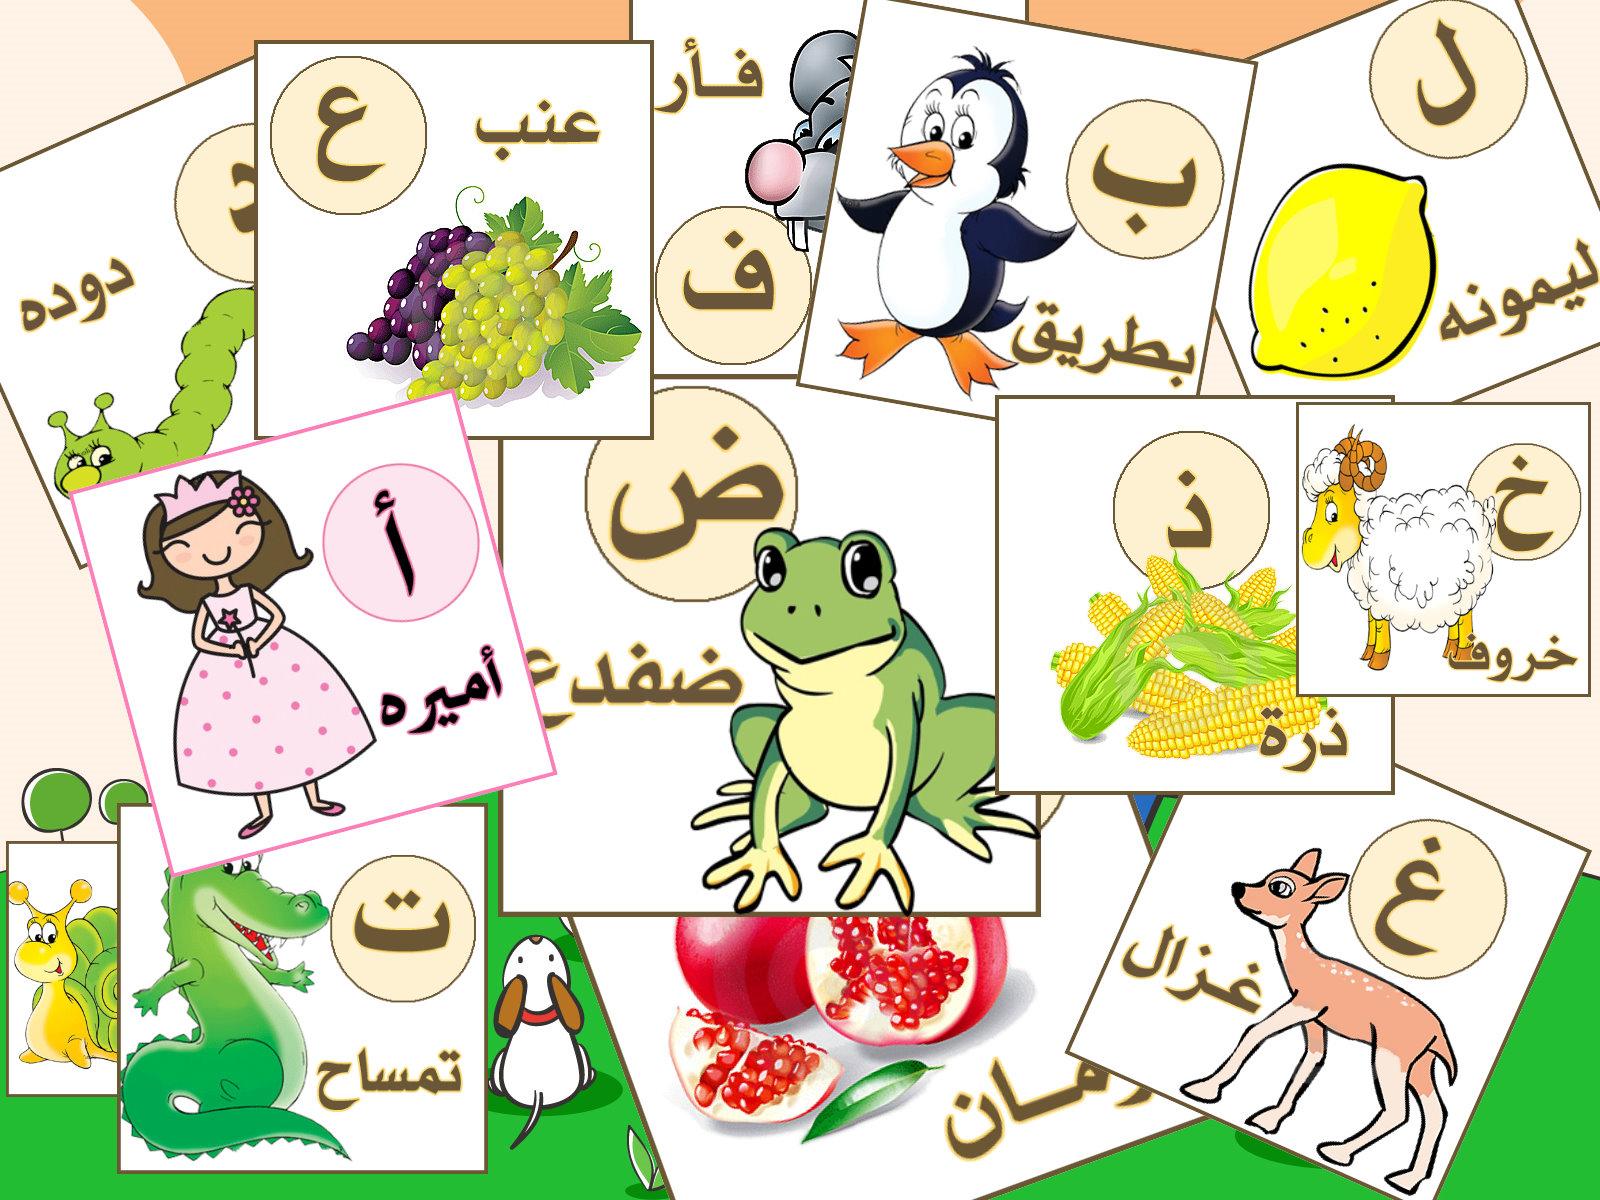 Photo of بطاقات الحروف الهجائية ,  بطاقات الحروف الهجائية من الالف للياء لرياض الاطفال